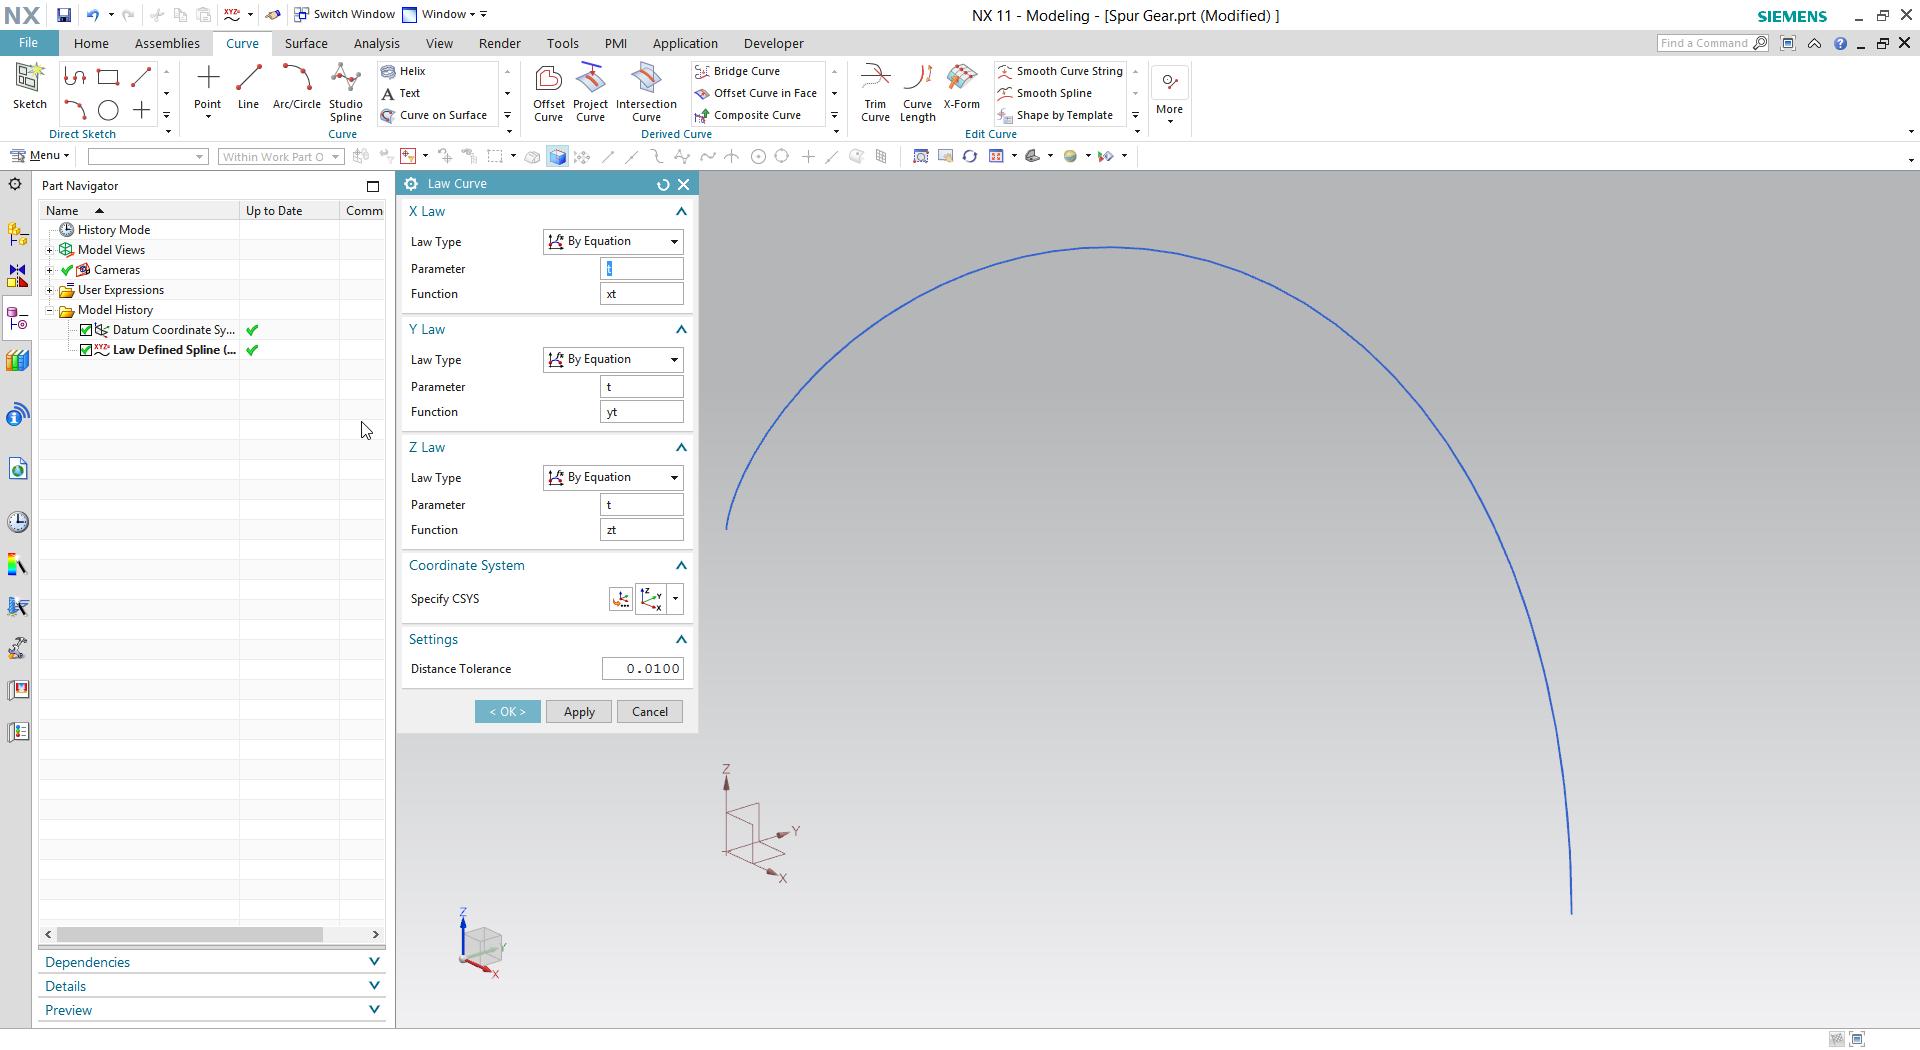 How To Create Spur Gear In Siemens Nx Grabcad Tutorials